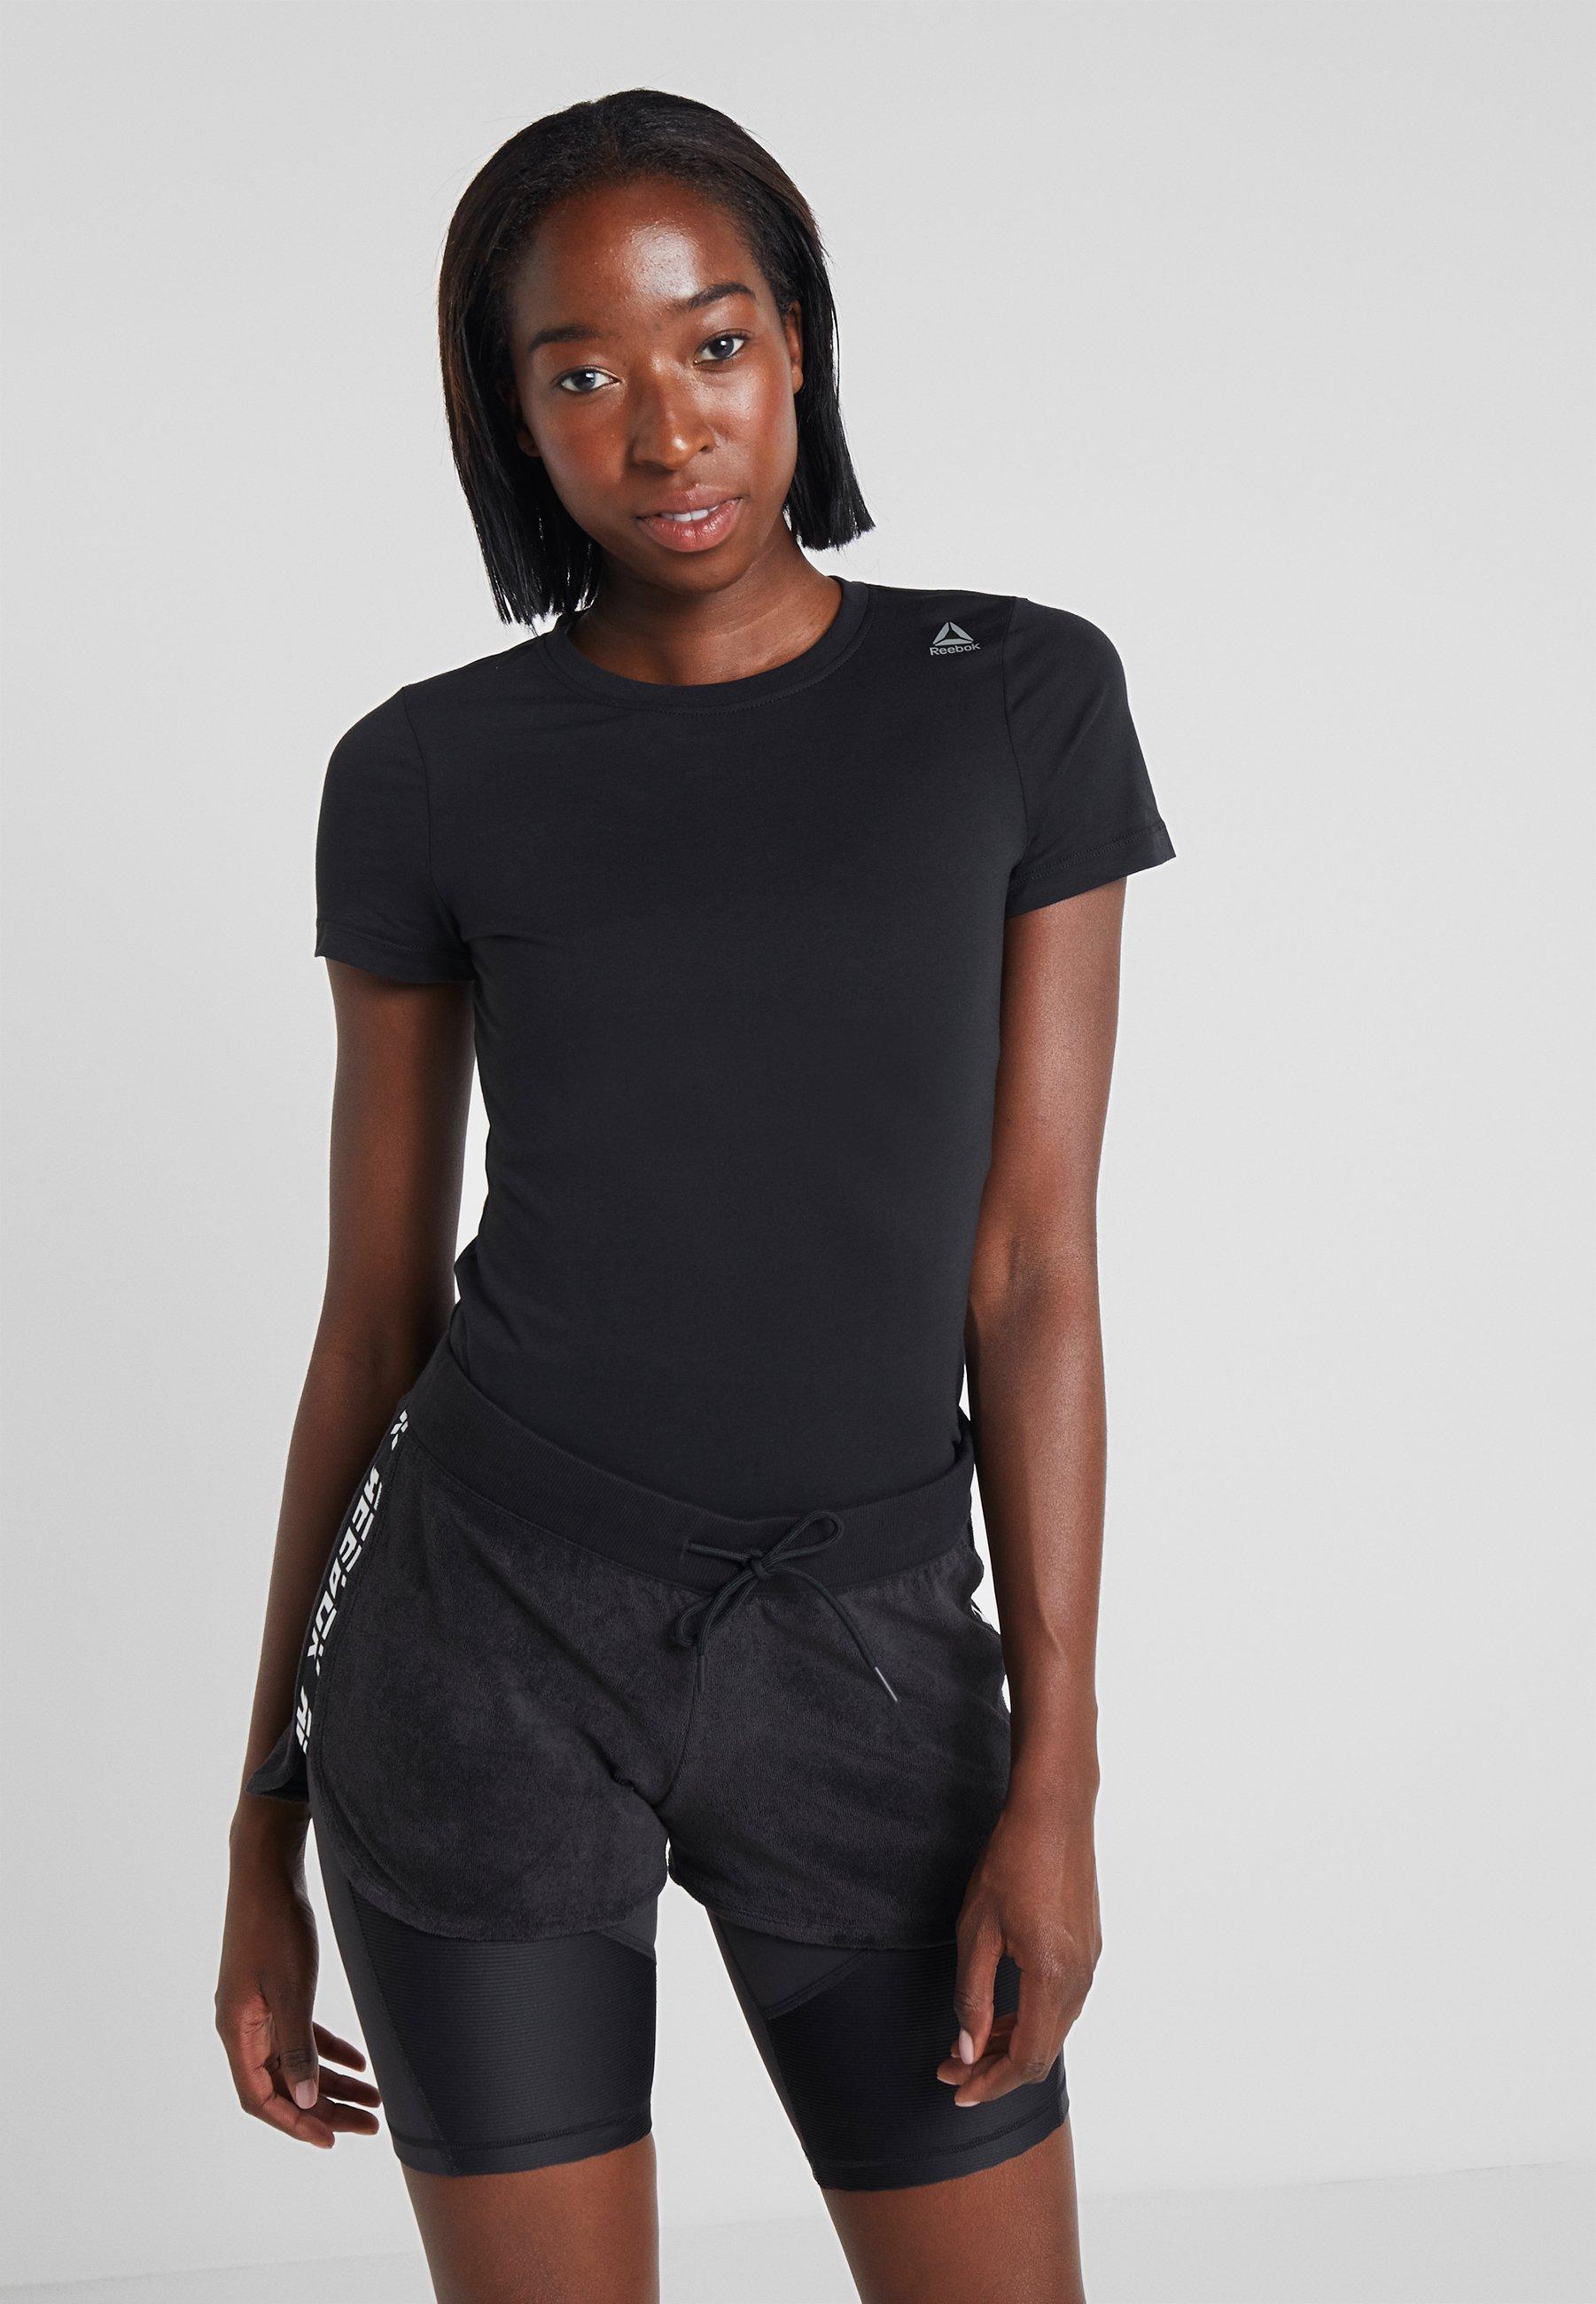 TeeT Black shirt Reebok Reebok Basique f76yYbg